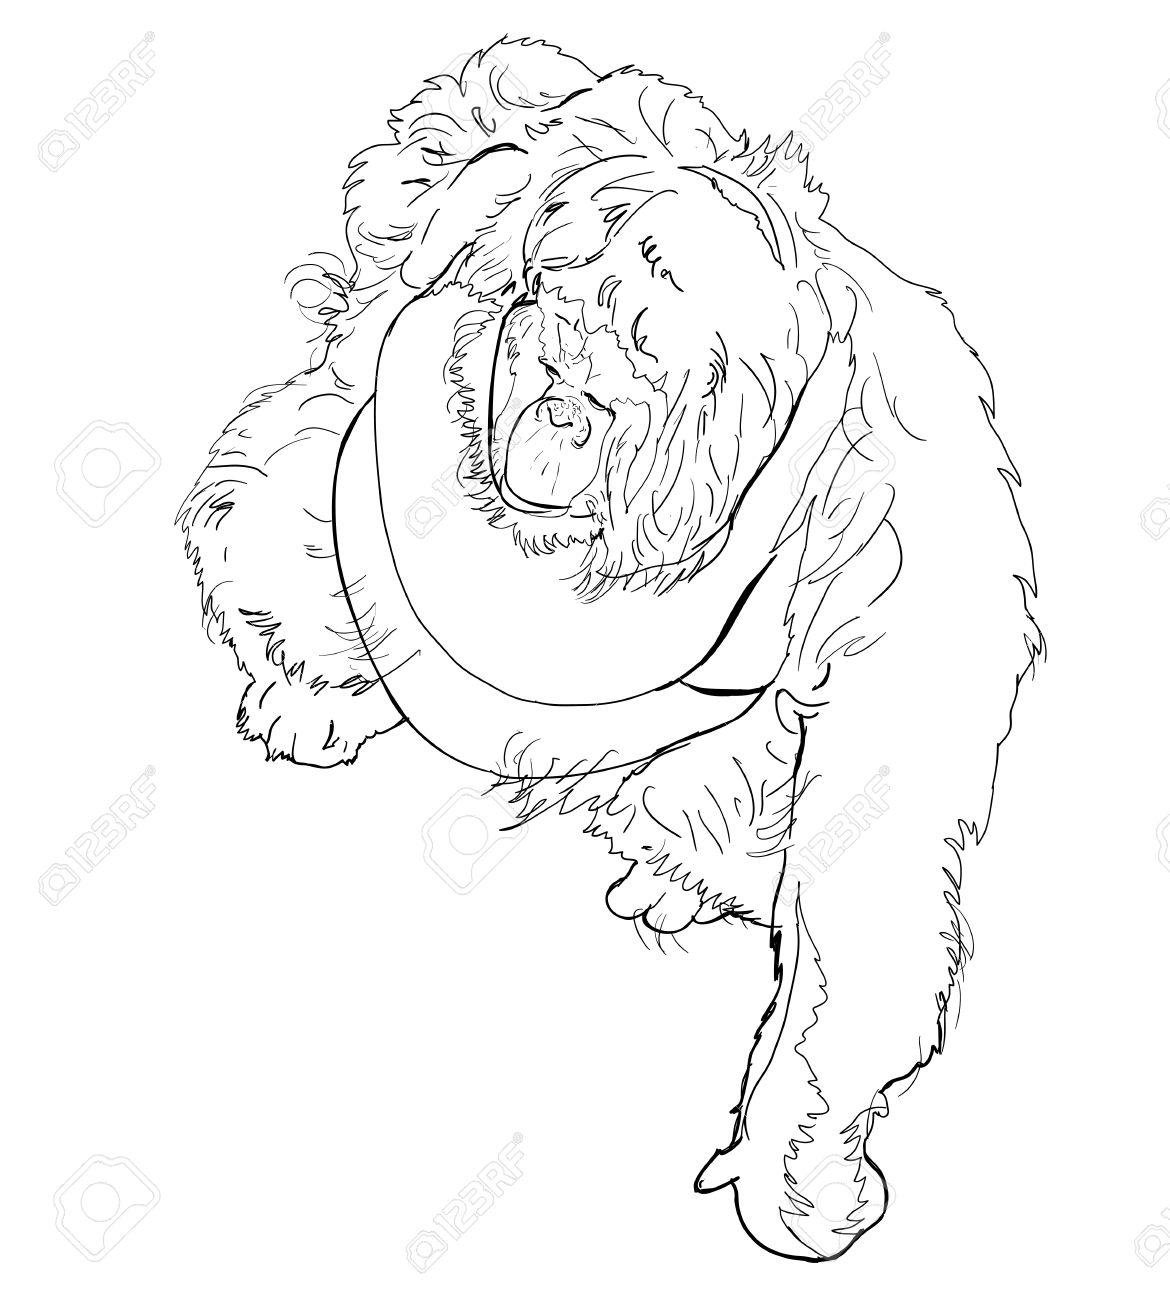 Uncategorized Orangutan Drawing the vector drawing style of orangutan royalty free cliparts stock 19708757